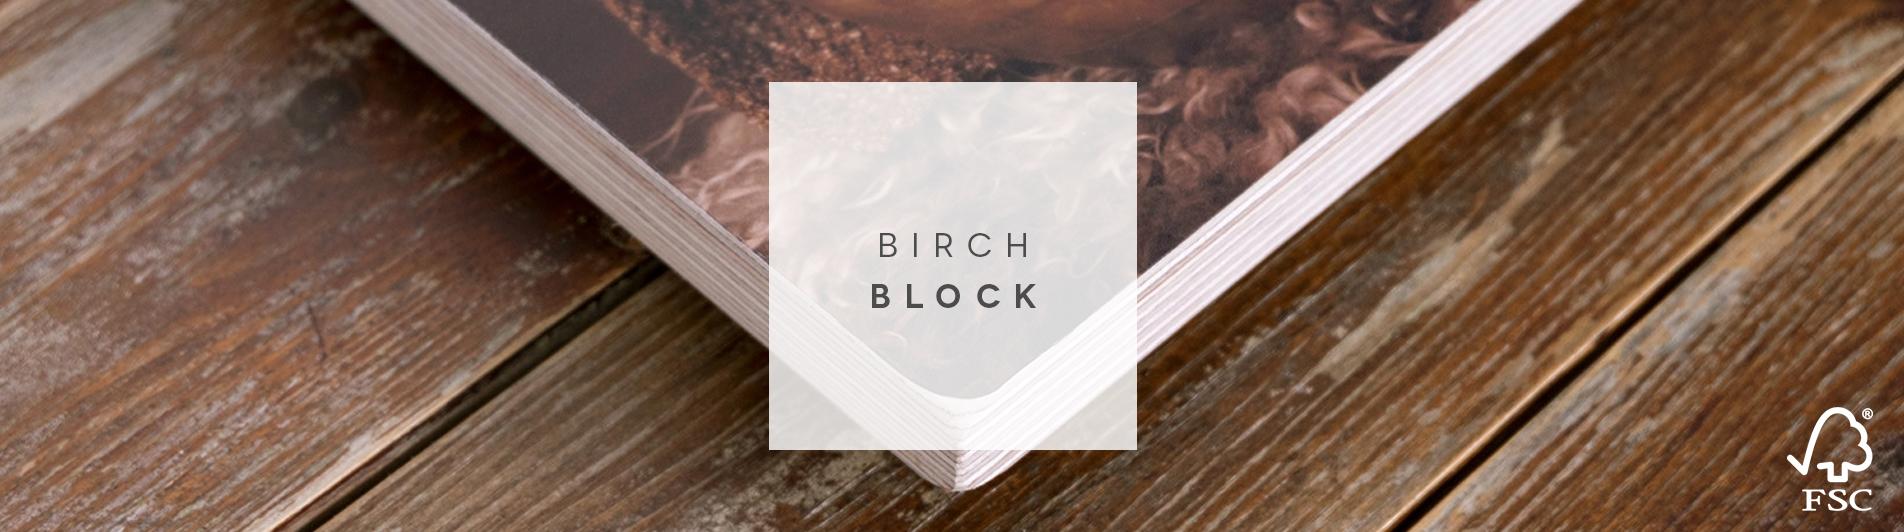 Birch Block FSC